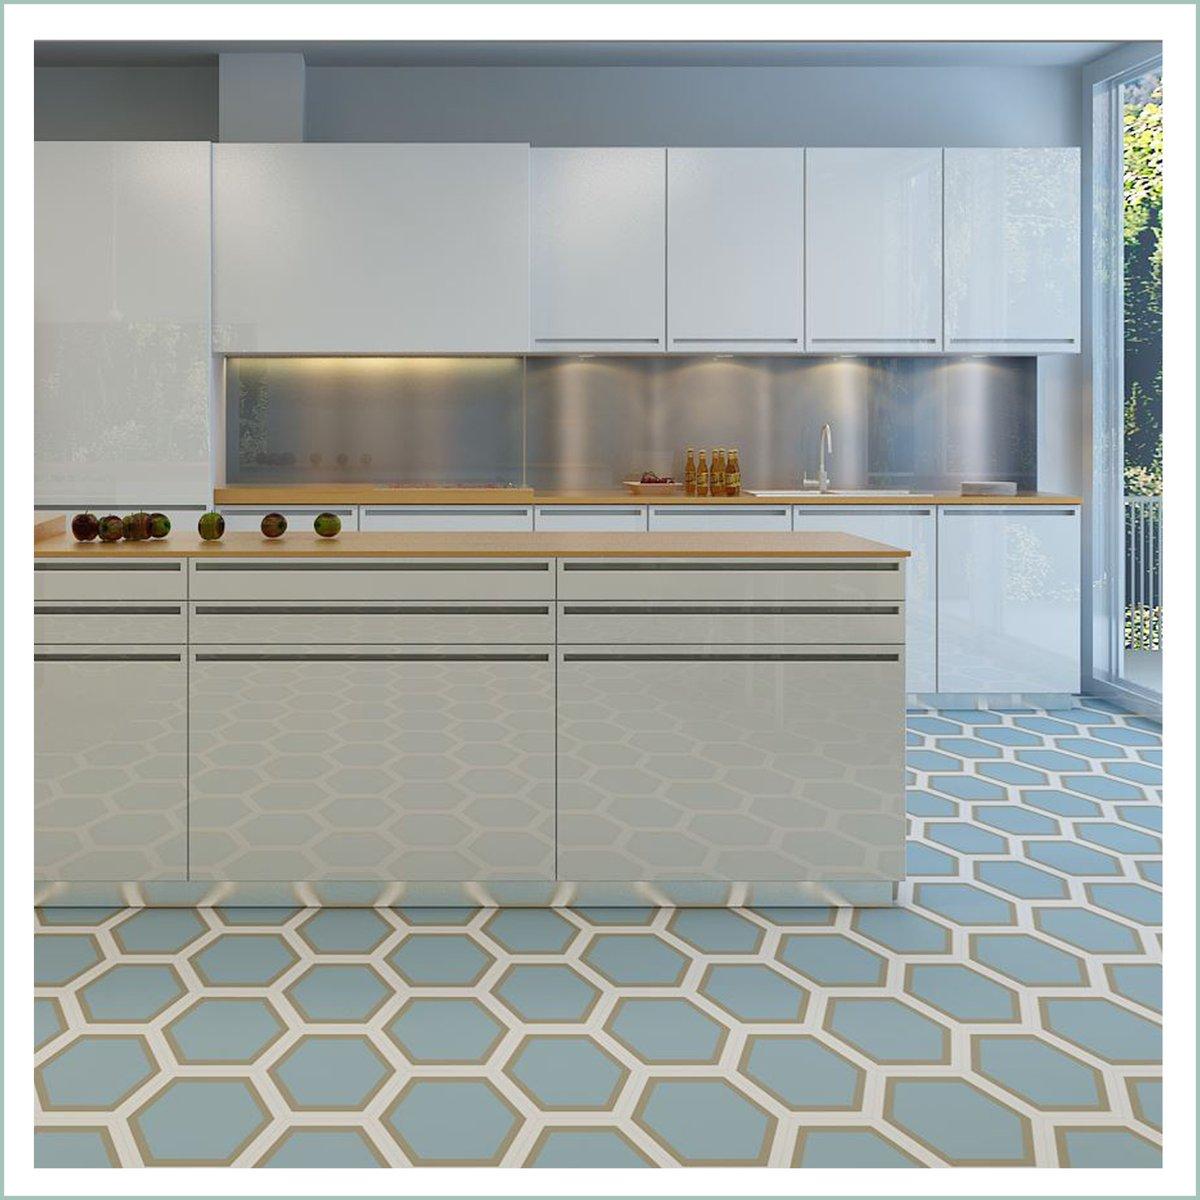 Kitchen Design Ideas With Hexagon Kitchen Floor Tiles